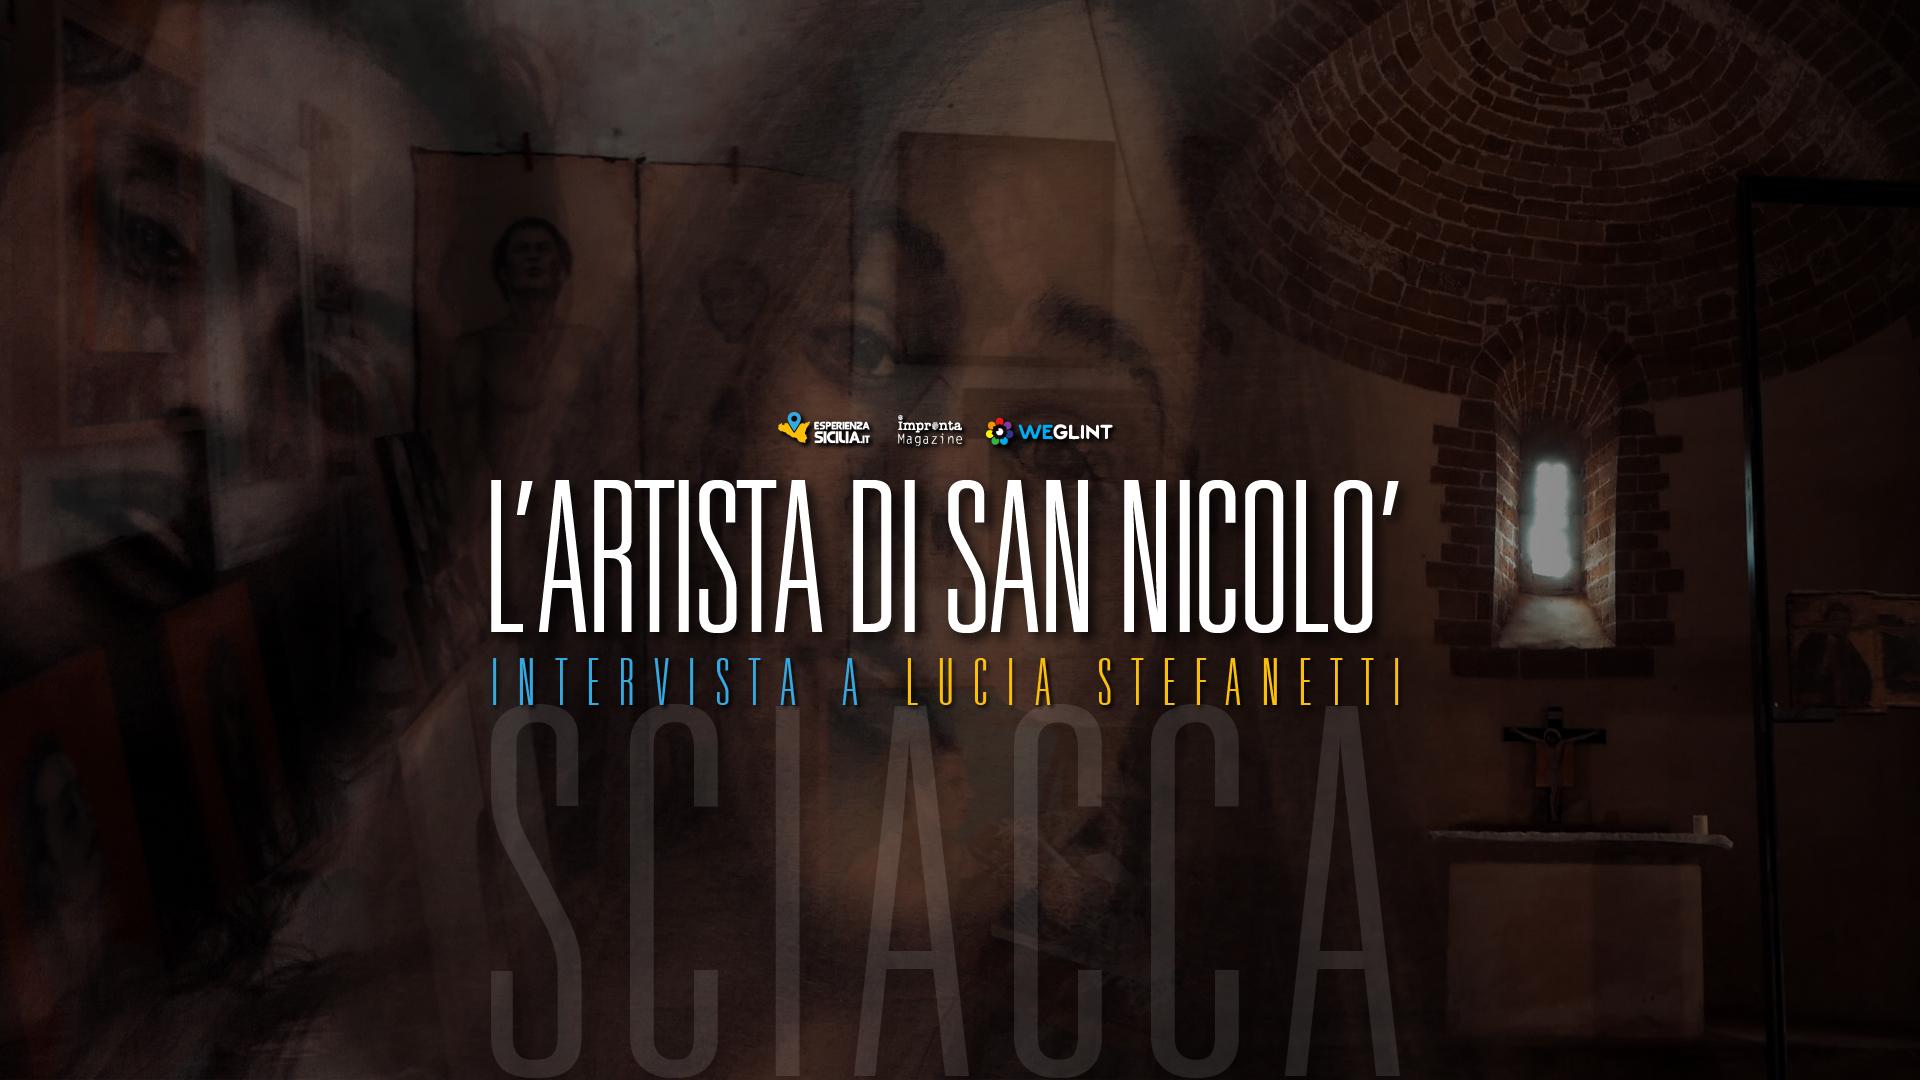 L'artista di San Nicolò